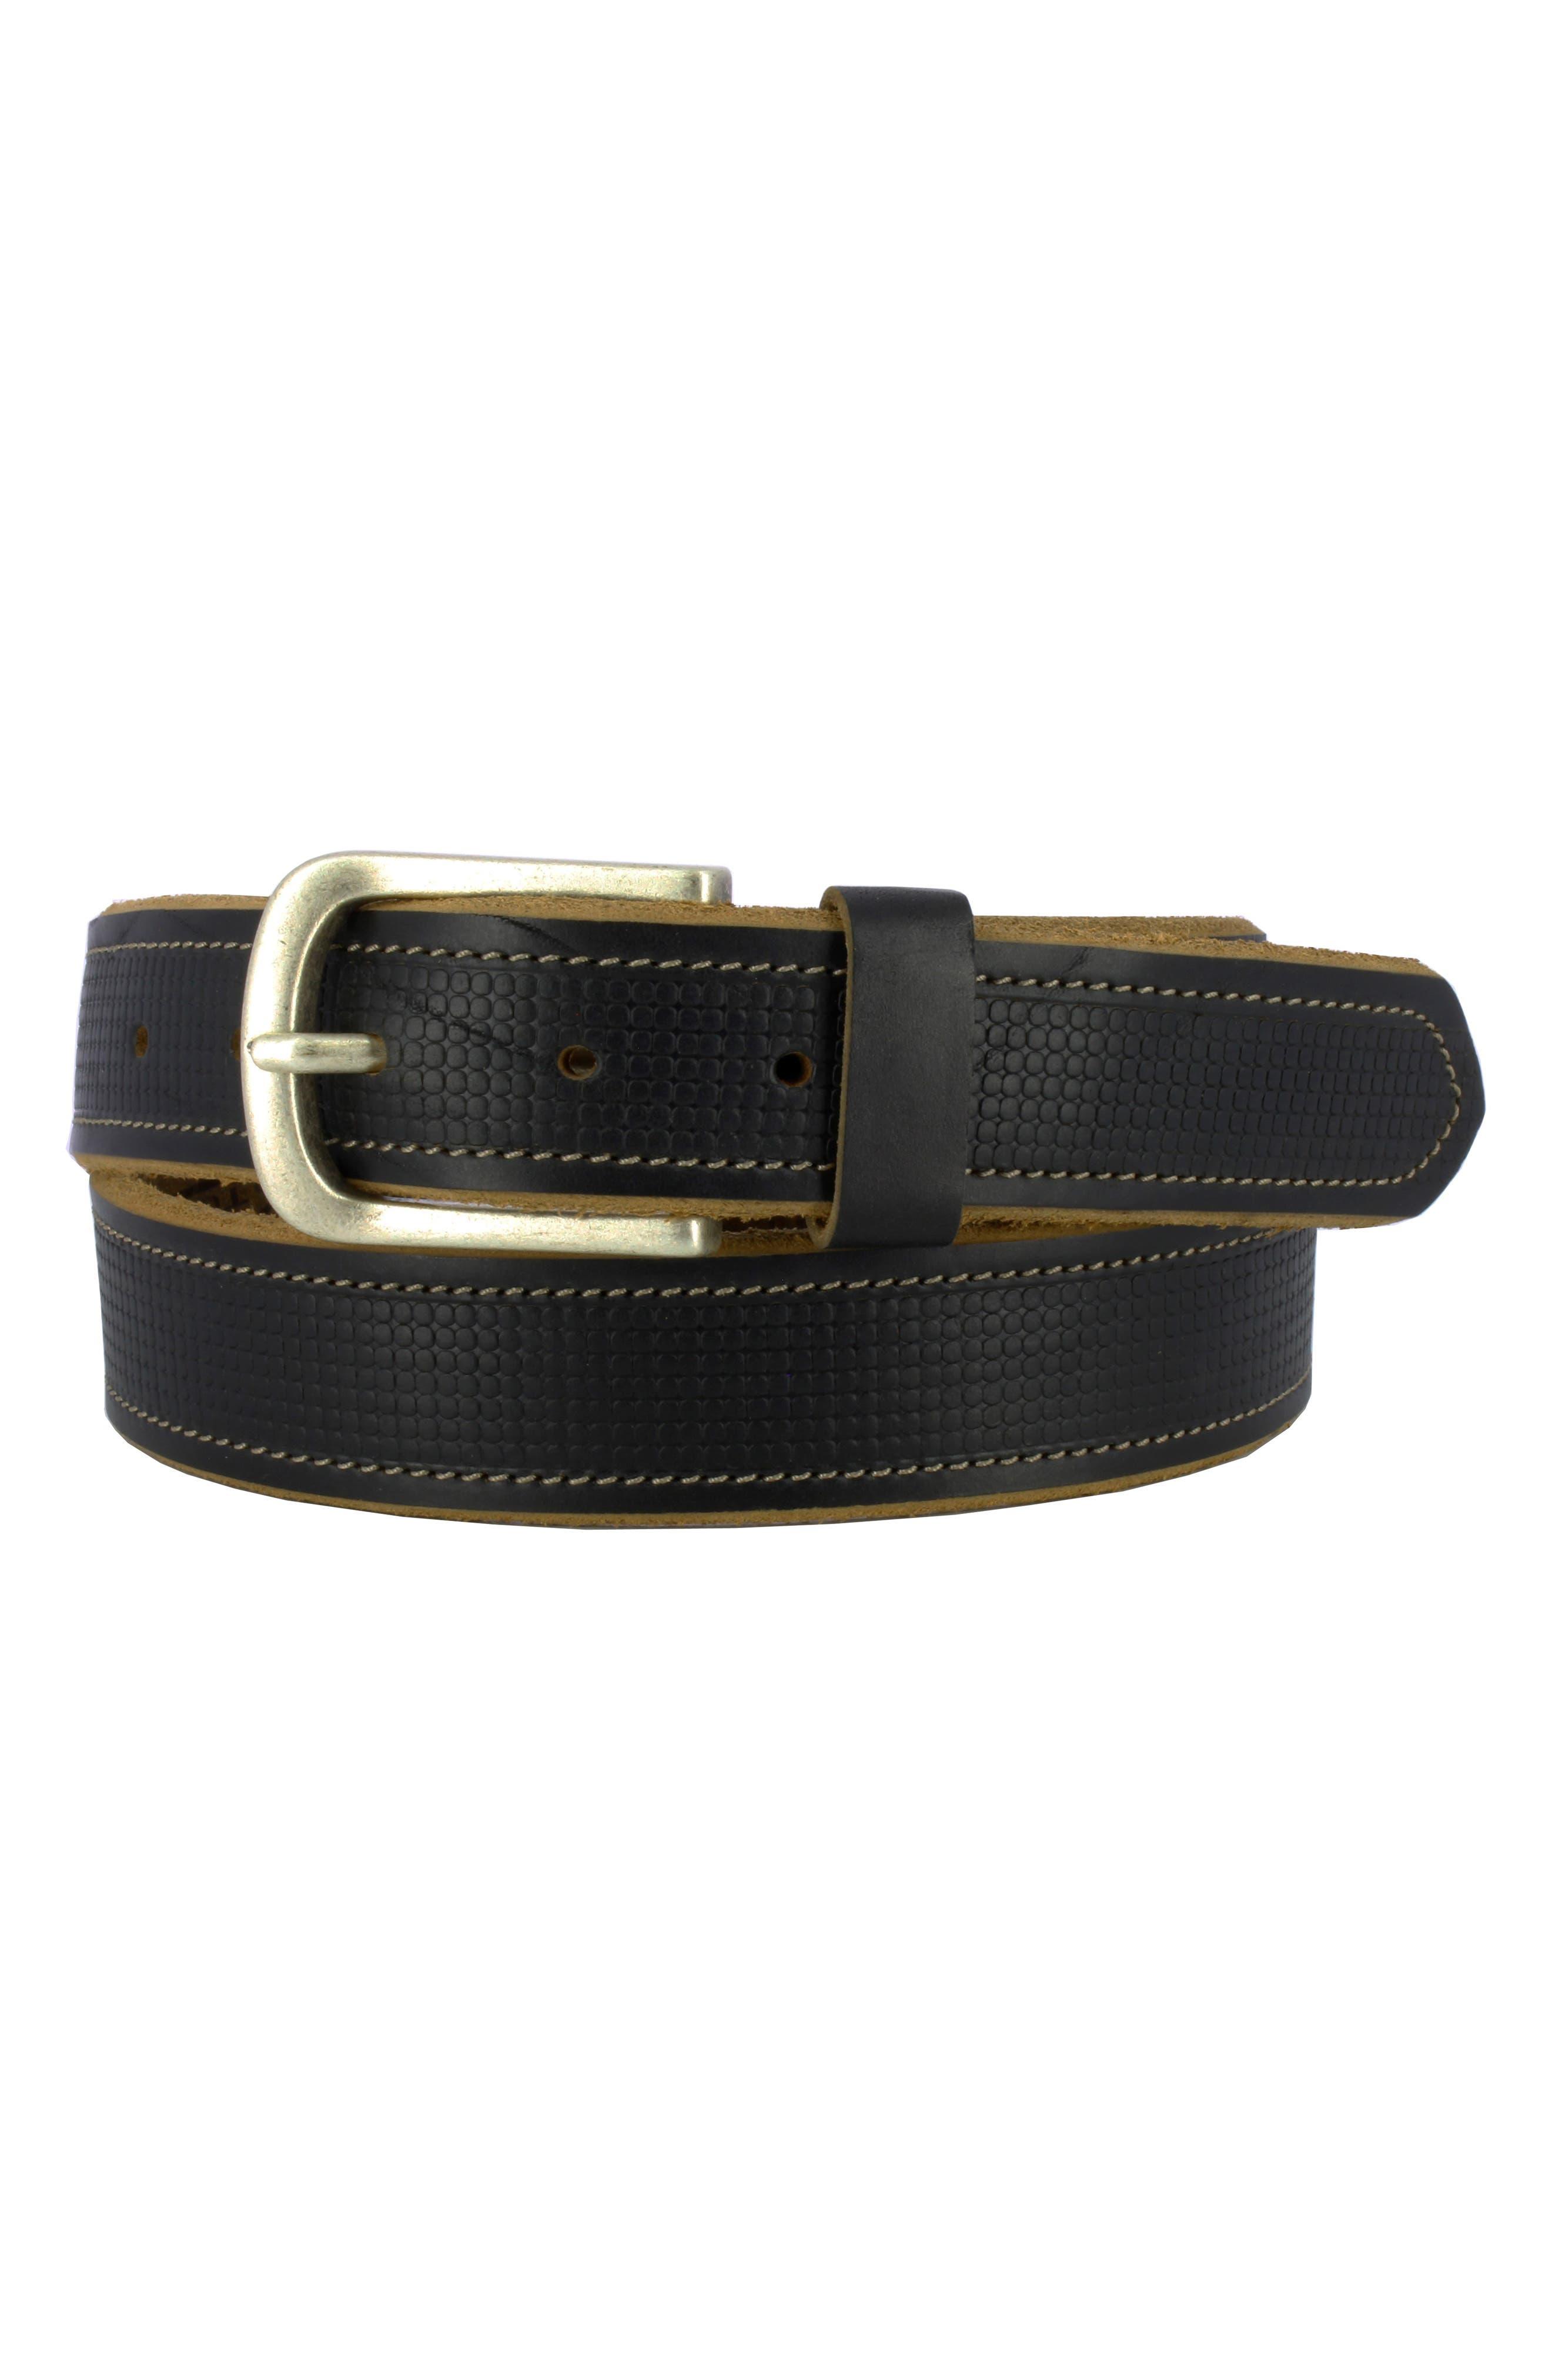 Sixx 2 Horween Leather Belt,                             Main thumbnail 1, color,                             BLACK